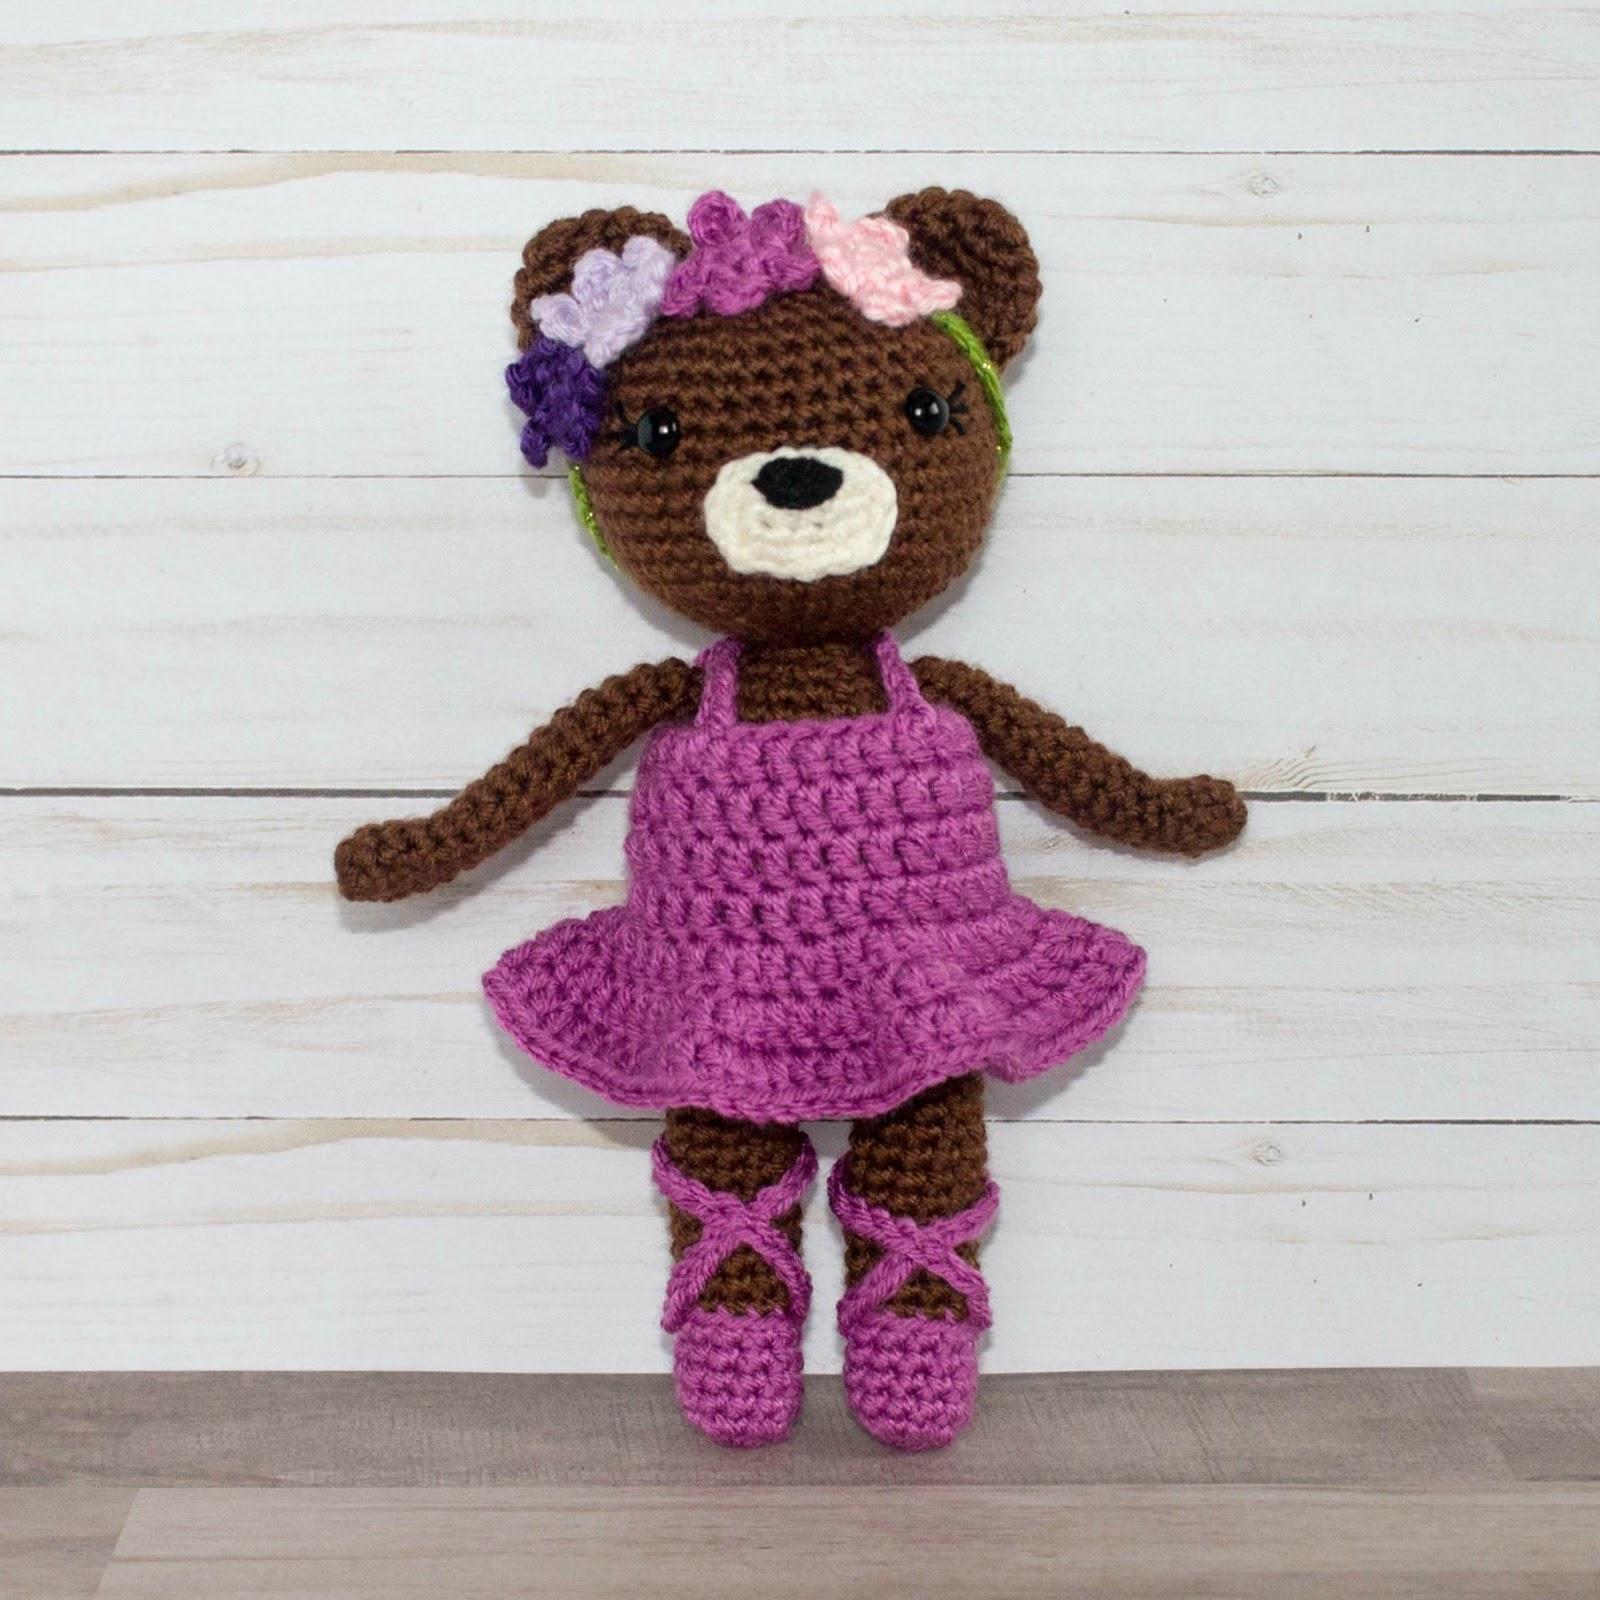 Crochet Doll Animals : Mini Ballerina Animal Crochet Dolls - The Friendly Red Fox